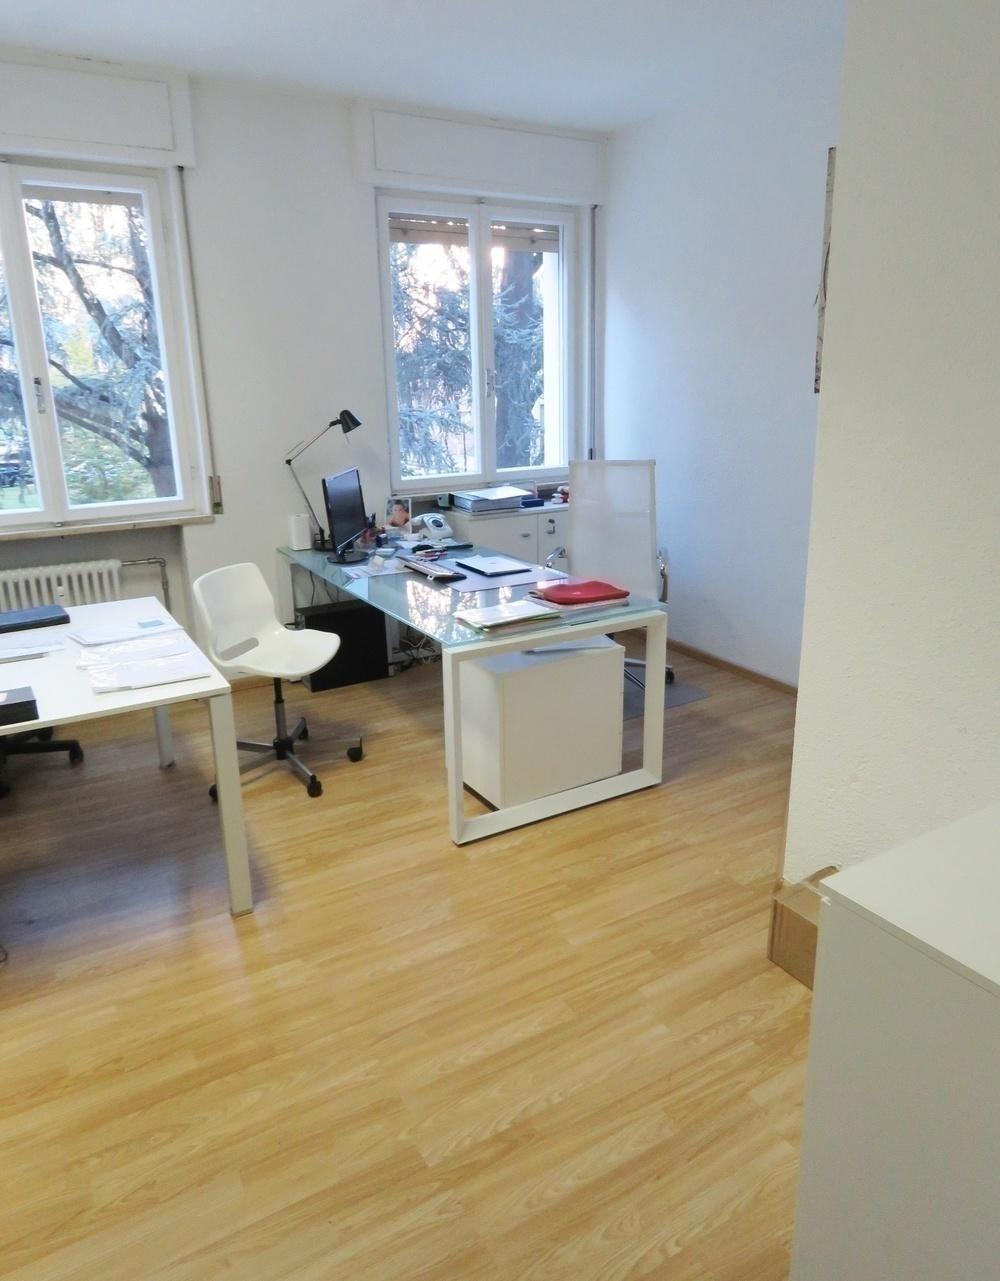 b ro praxis salon bozen gries quirein bozen kaufen immobilien s dtirol. Black Bedroom Furniture Sets. Home Design Ideas